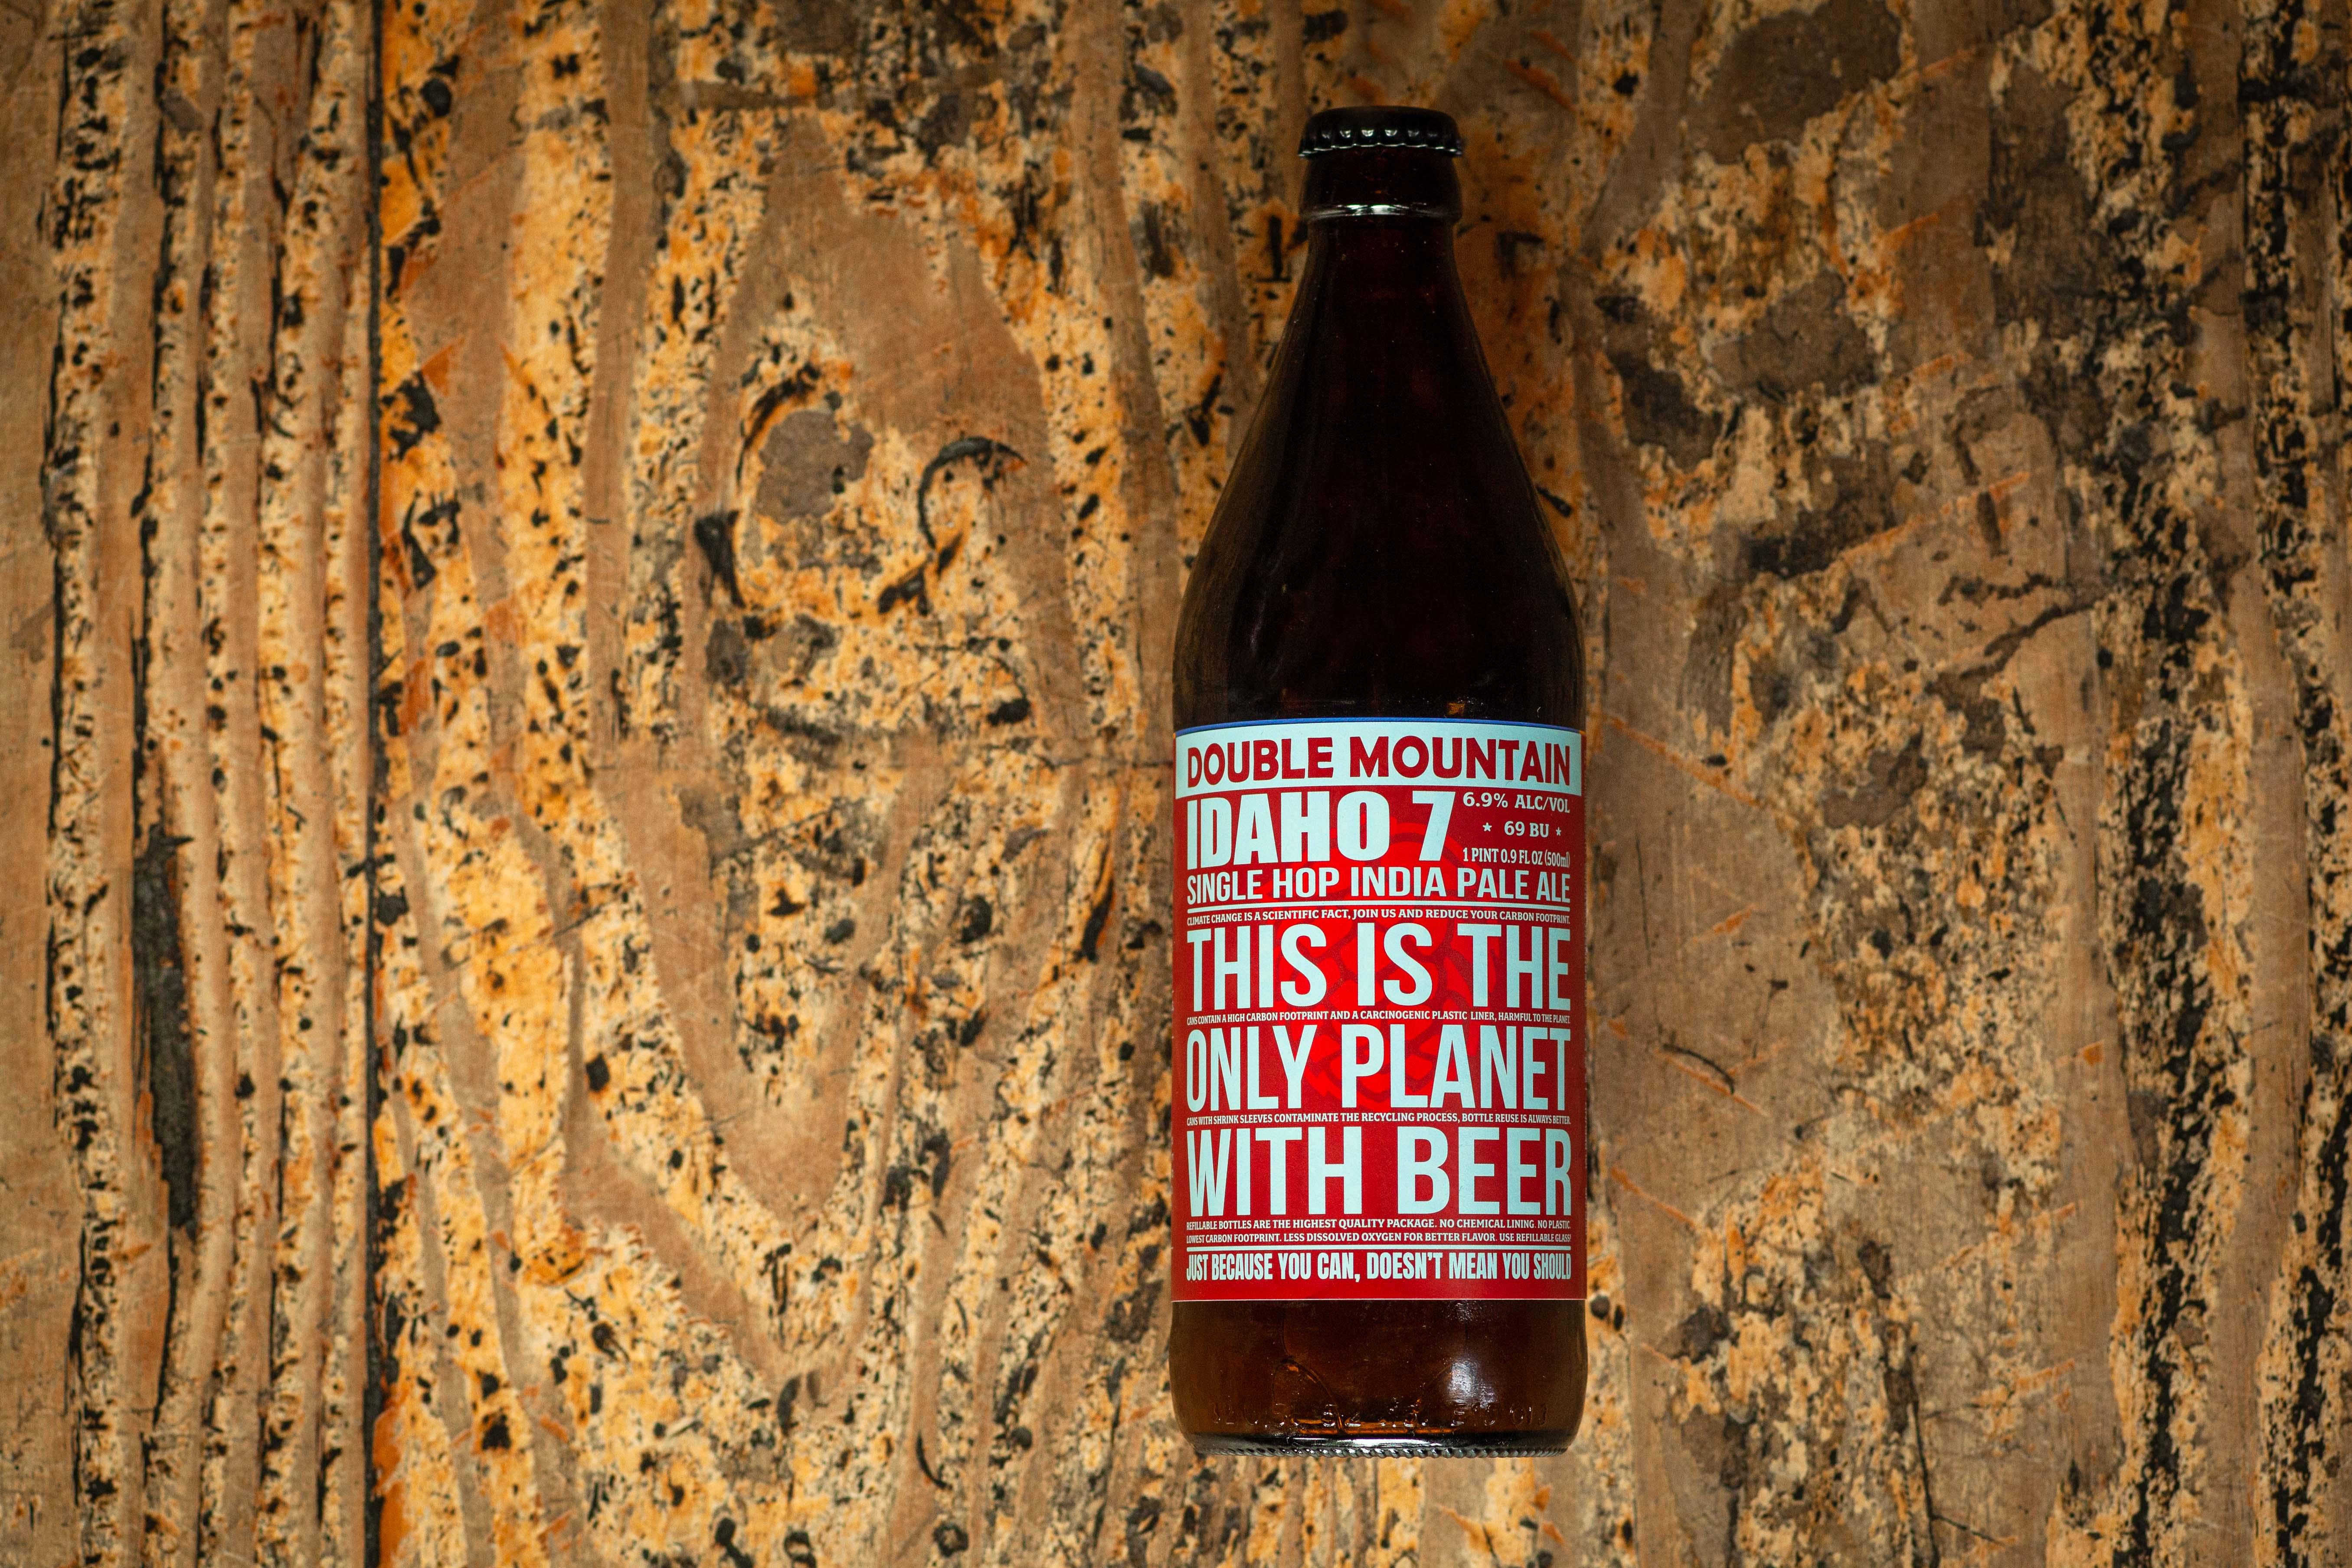 image of Idaho 7 IPA courtesy of Double Mountain Brewery